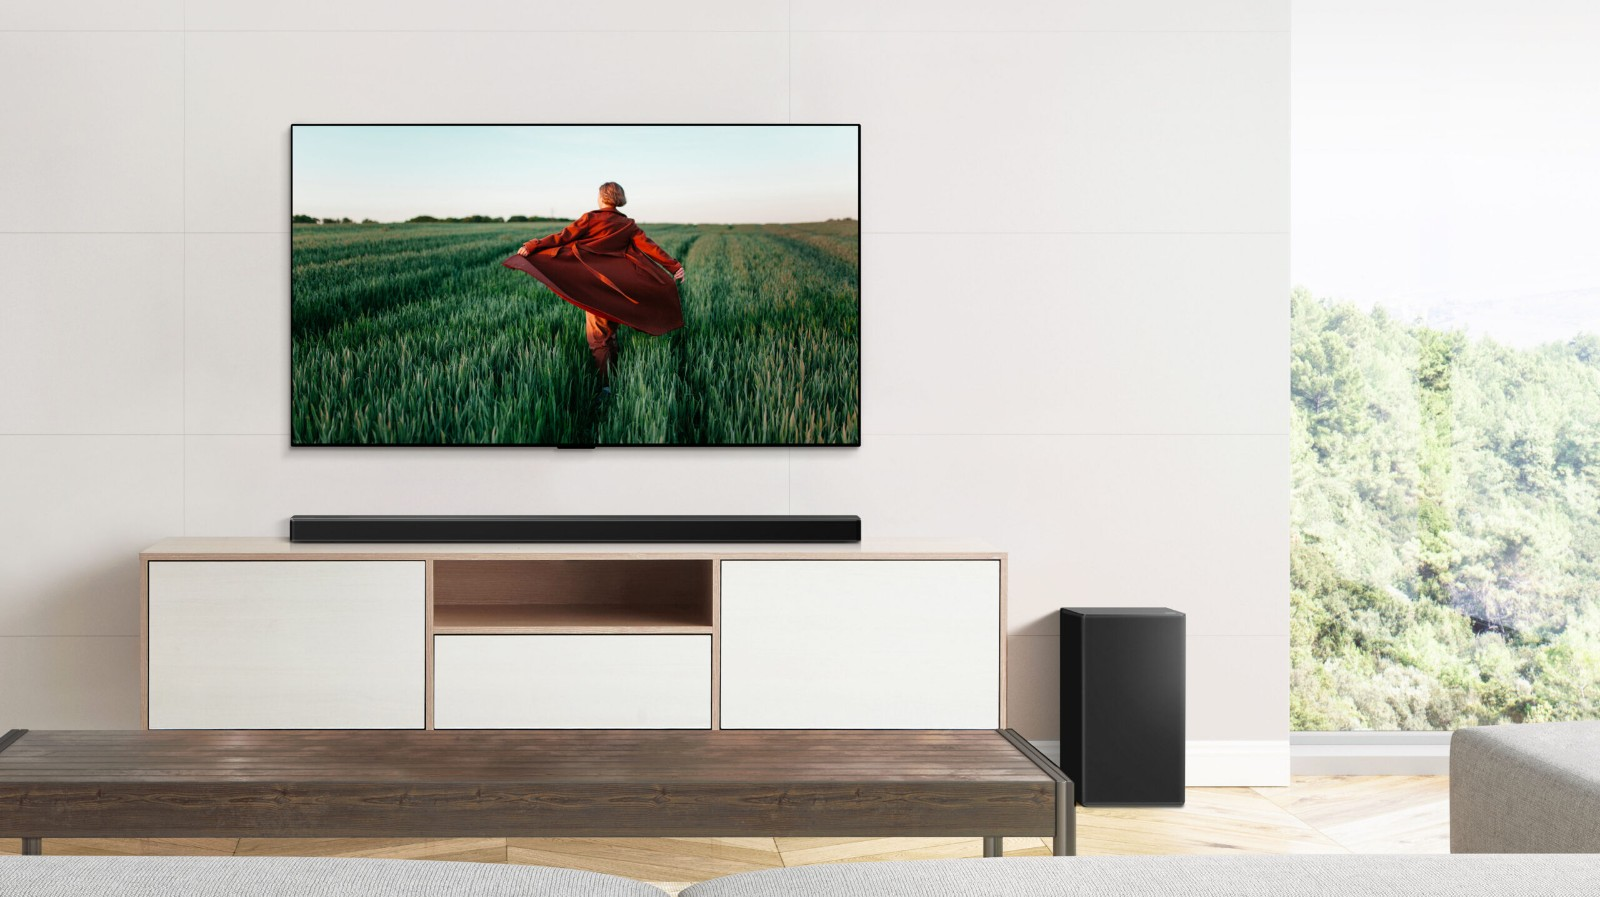 LG发布2021条形音箱产品线,支持苹果AirPlay 2串流投送等特色功能